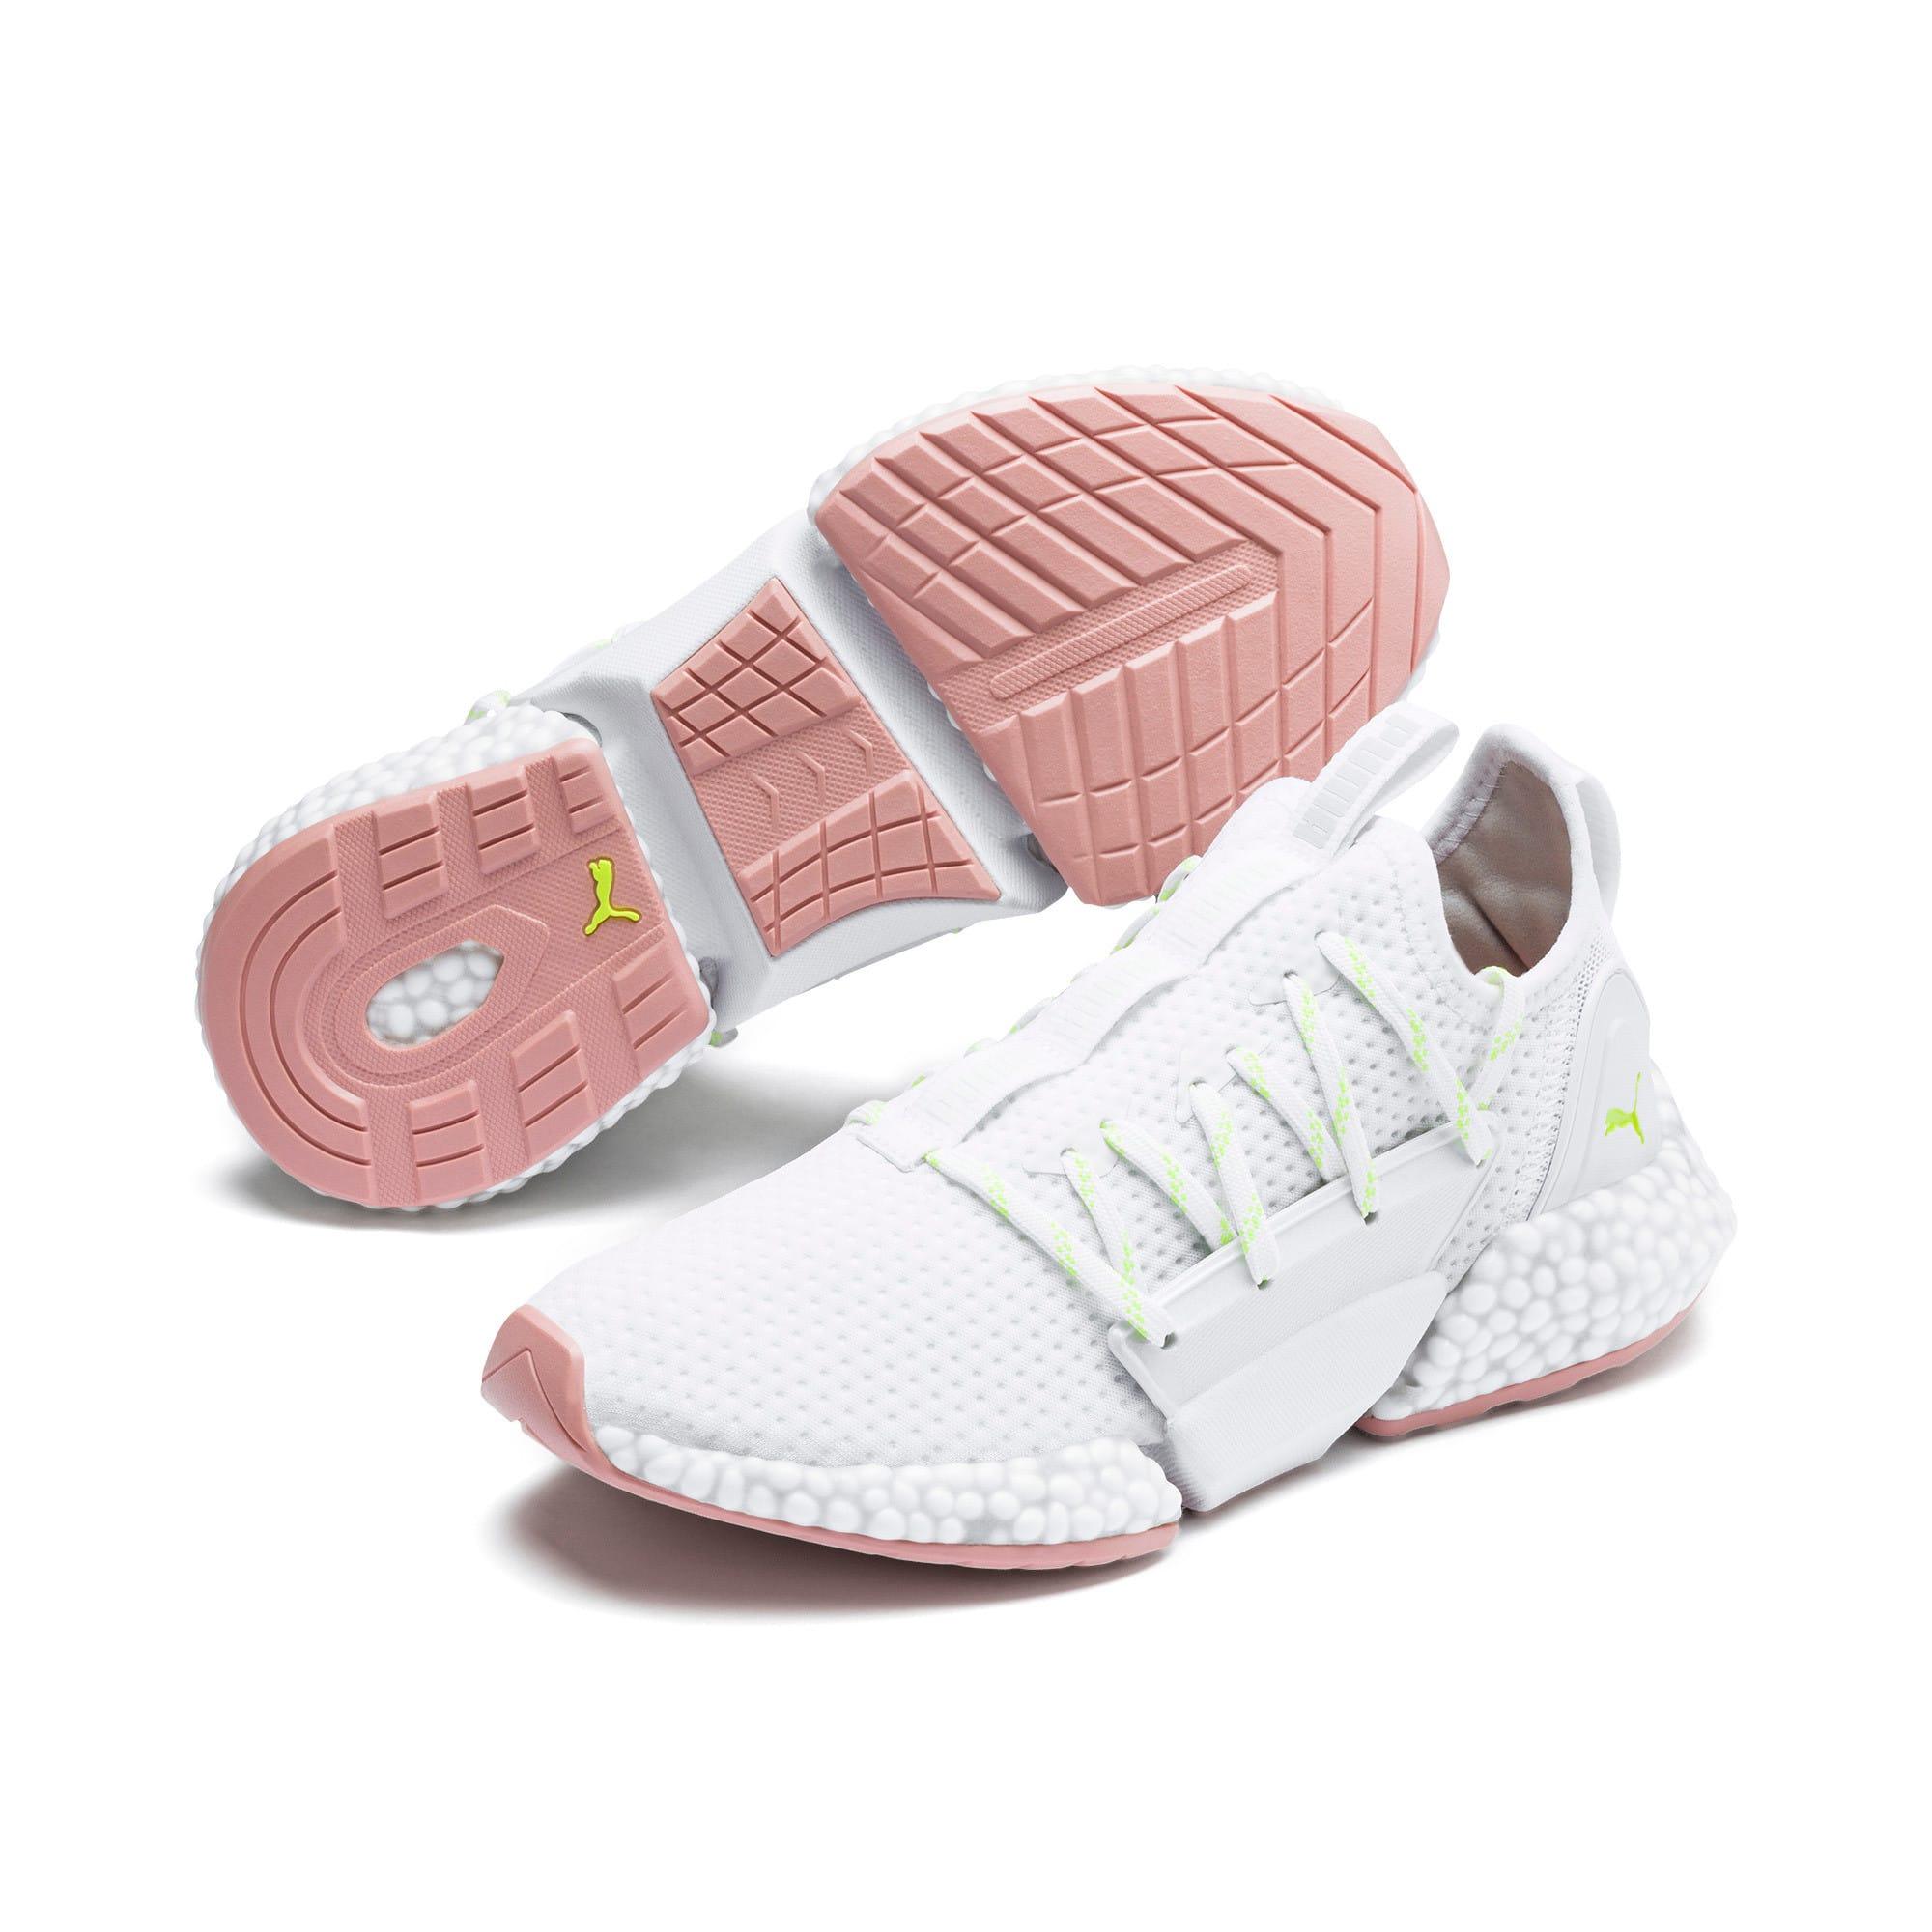 Thumbnail 2 of HYBRID Rocket Aero Women's Running Shoes, Puma White-Bridal Rose, medium